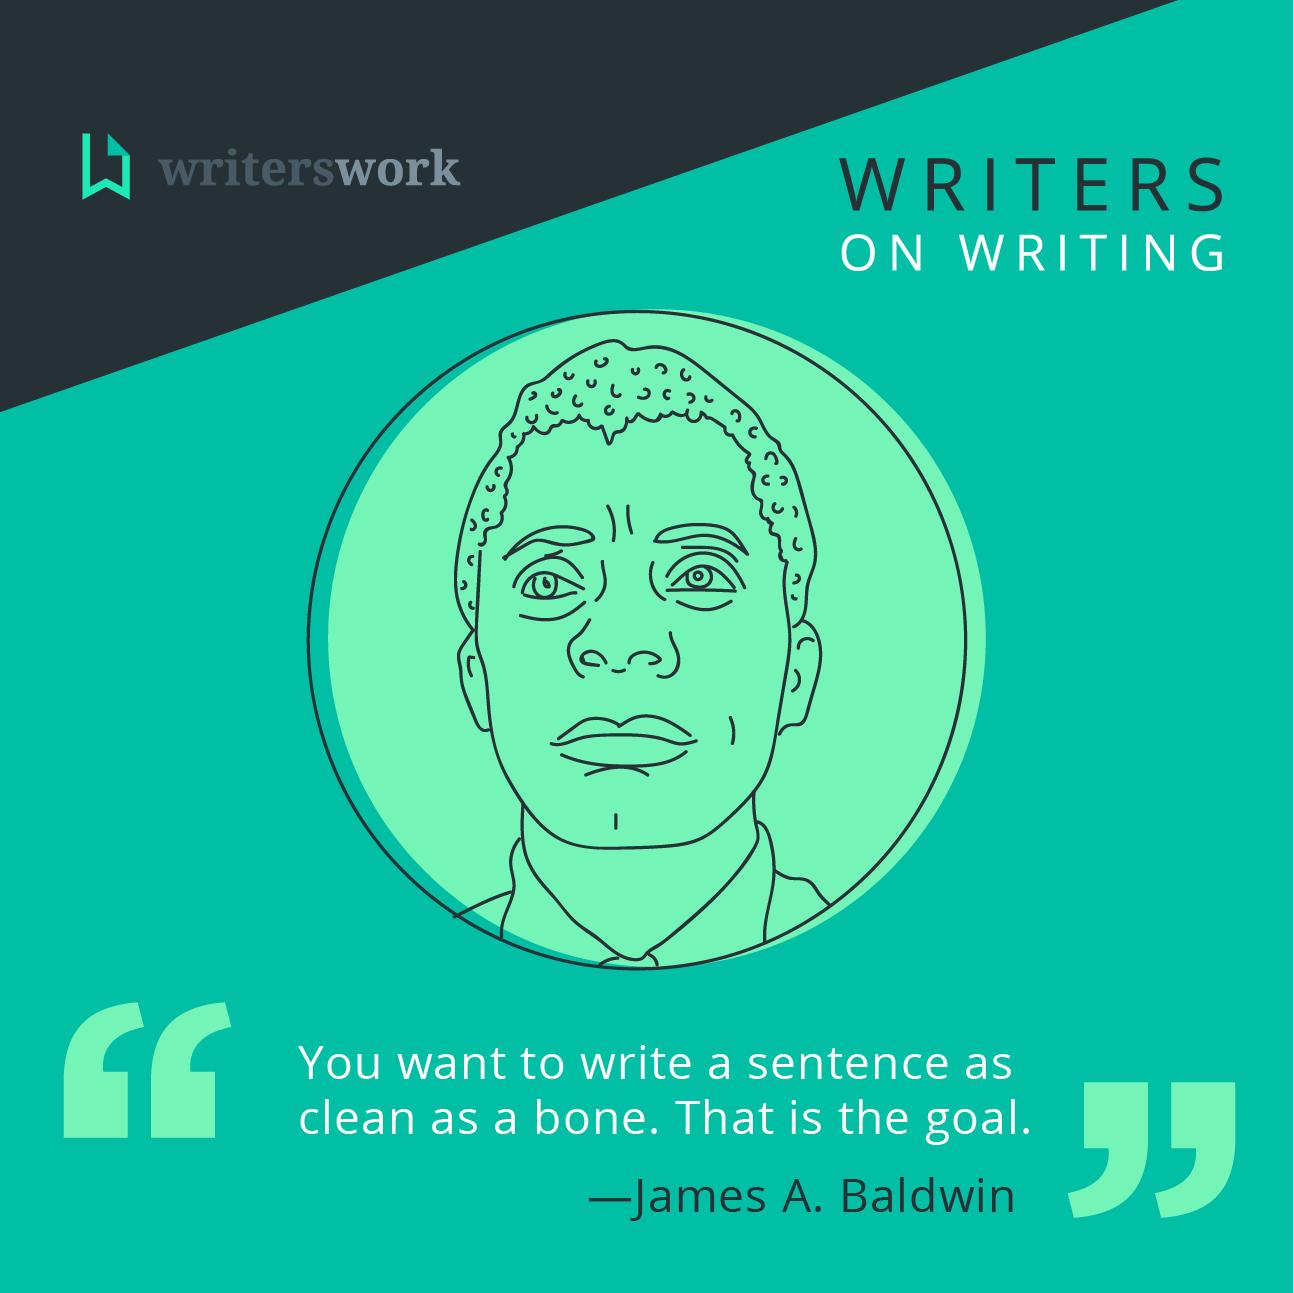 James A. Baldwin quote